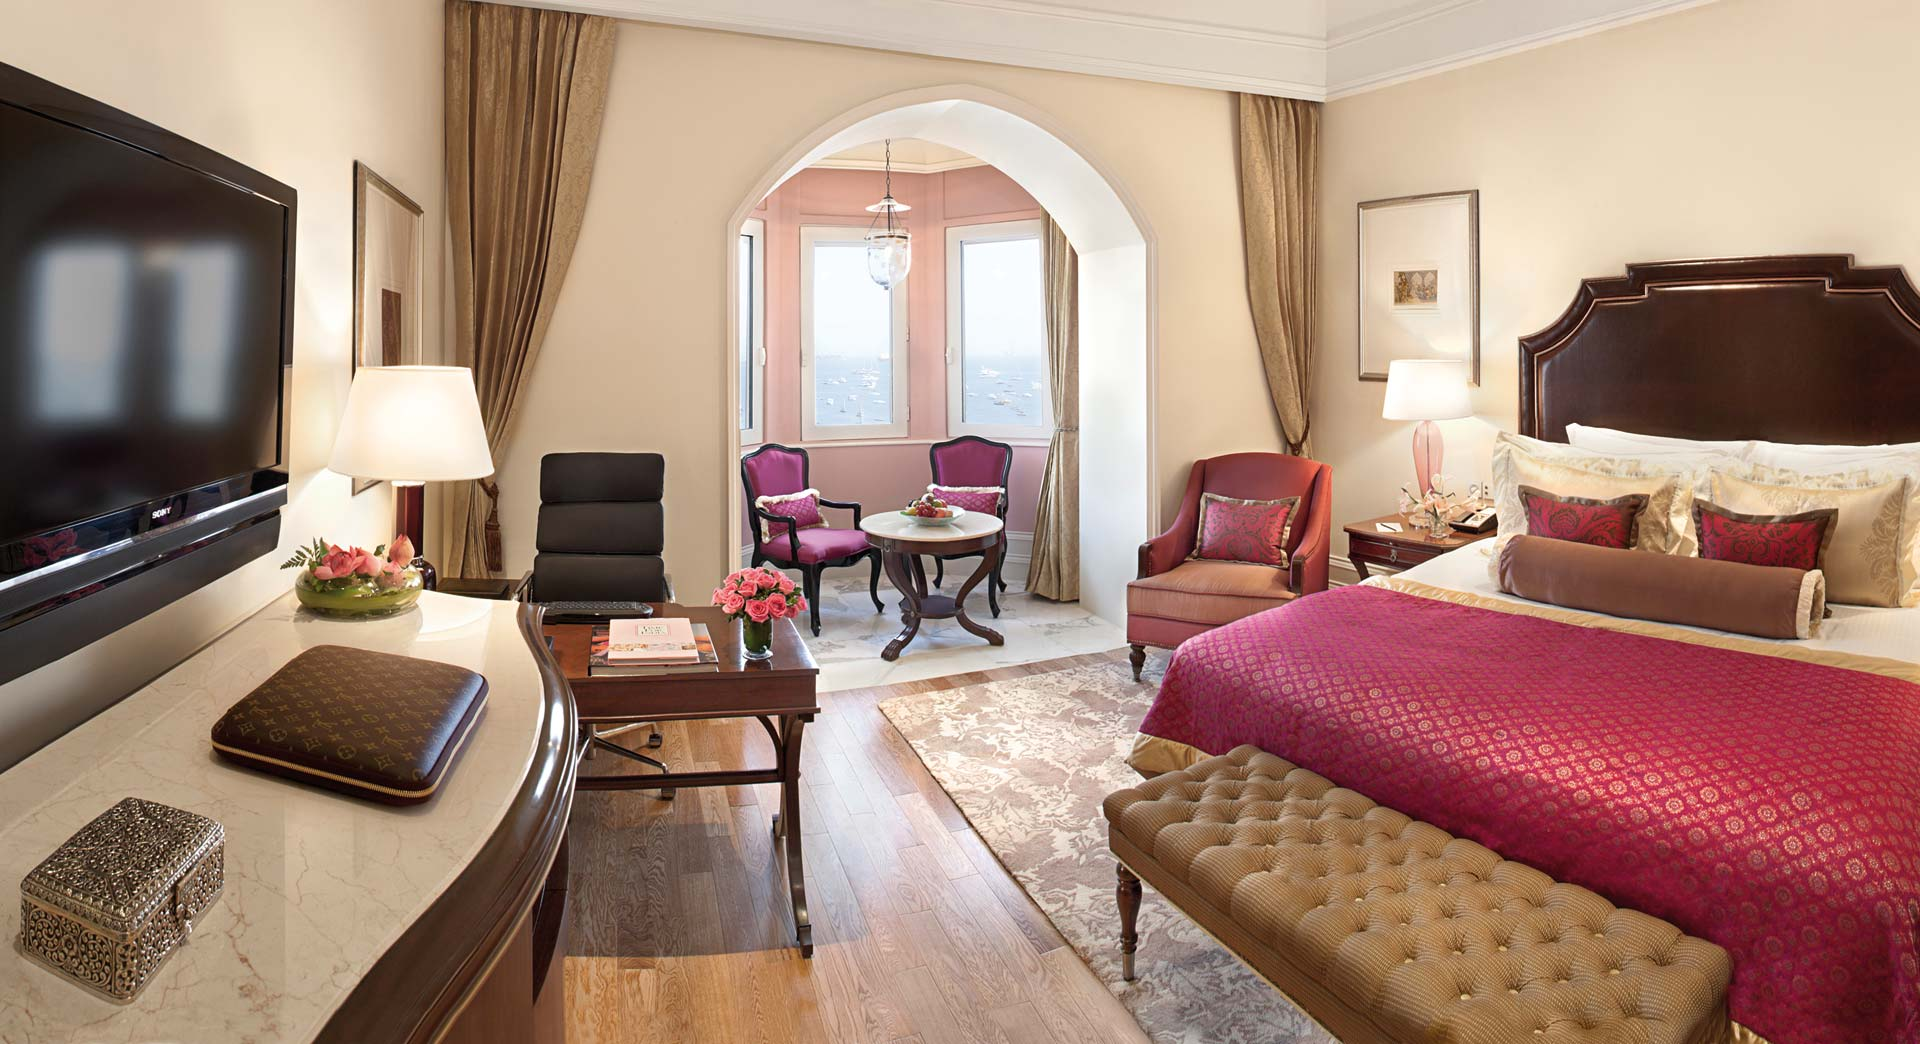 The Taj Mahal Palace Luxury Grand Room